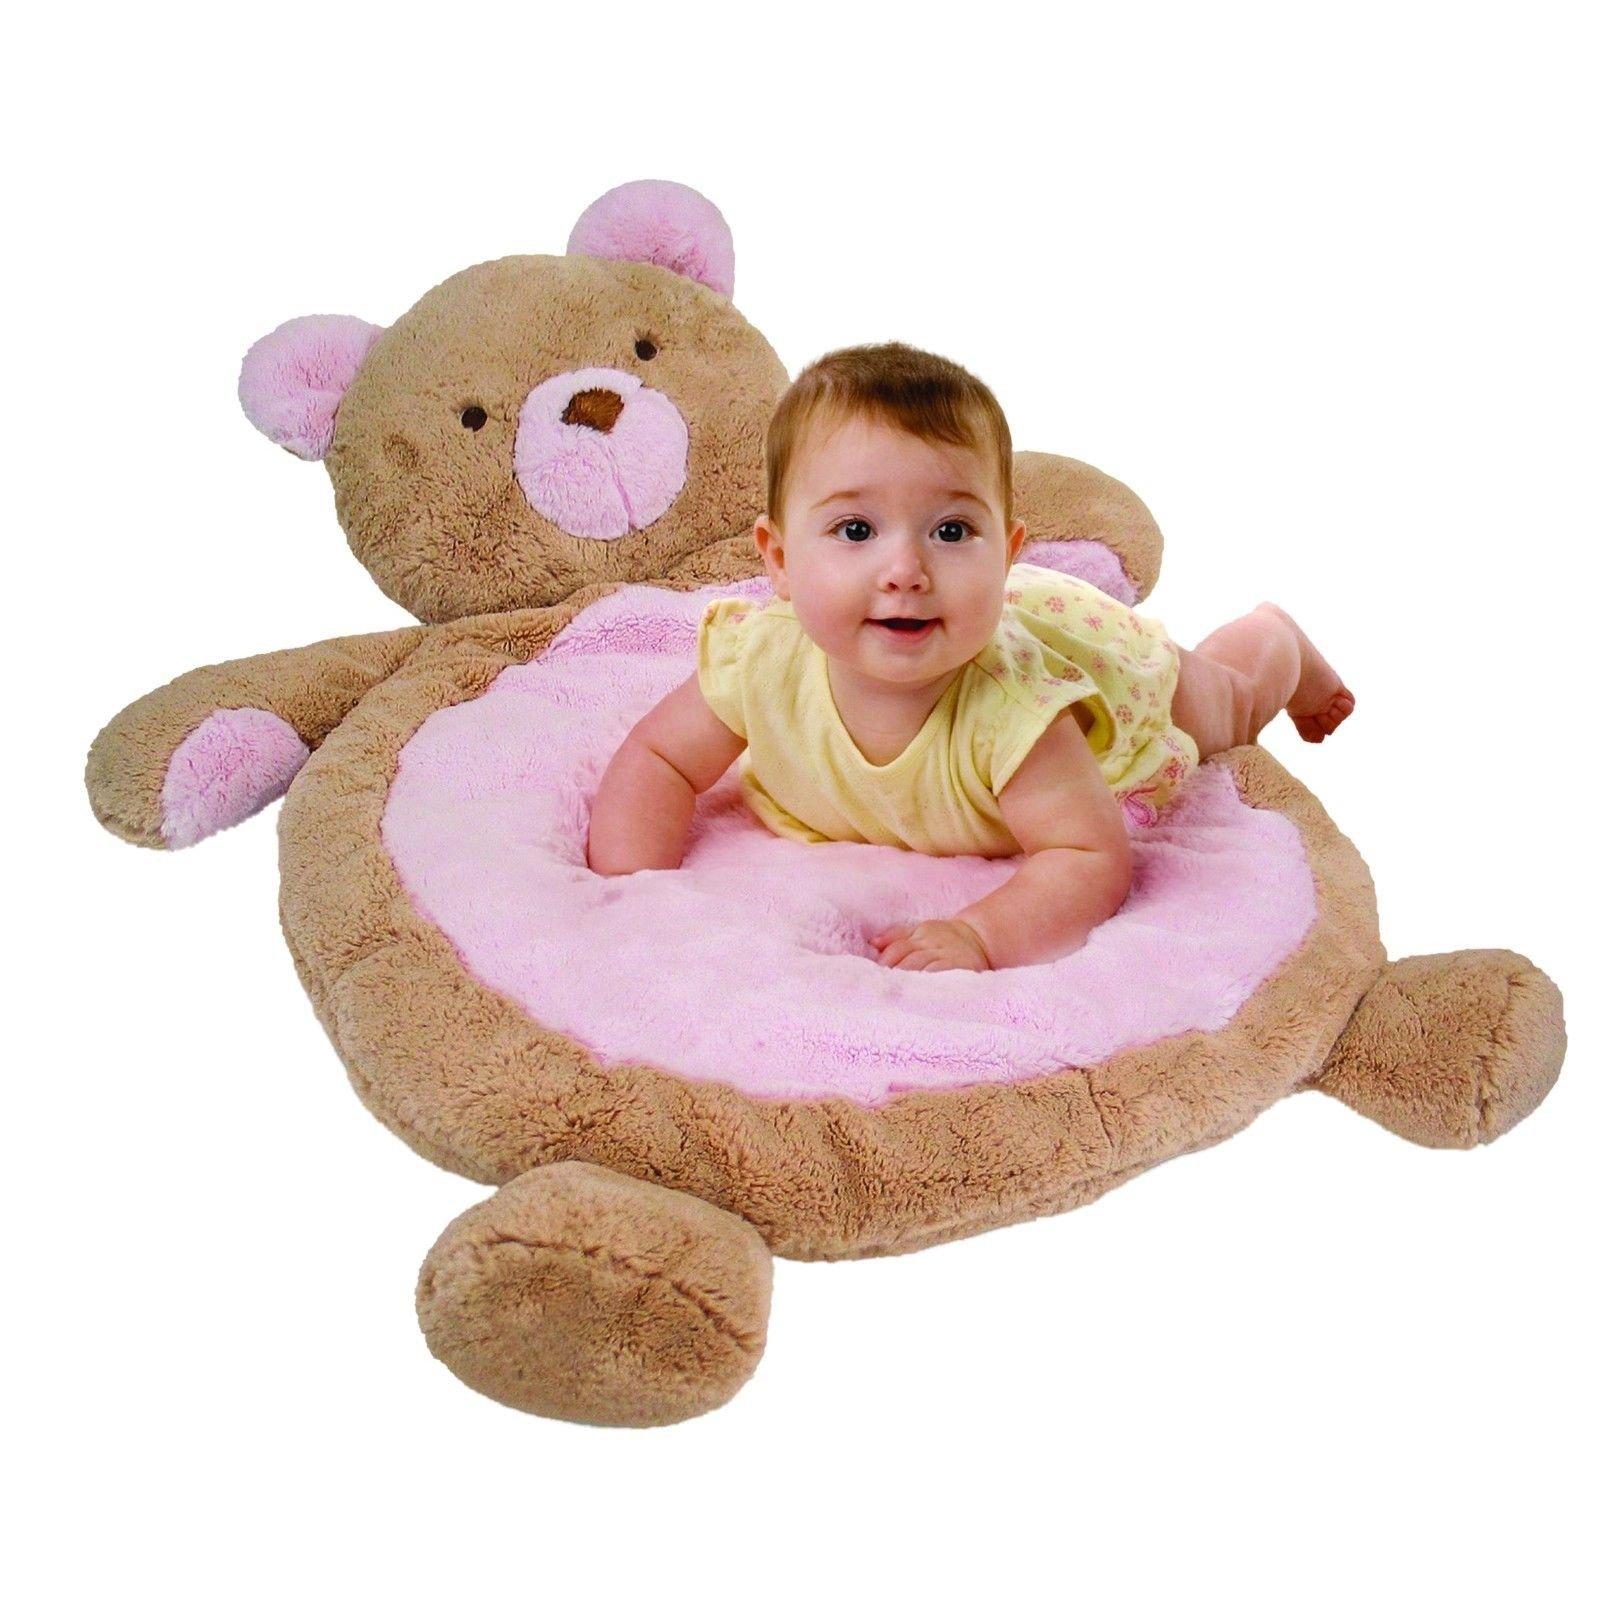 mary meyer bestever baby play mat soft plush ebay. Black Bedroom Furniture Sets. Home Design Ideas